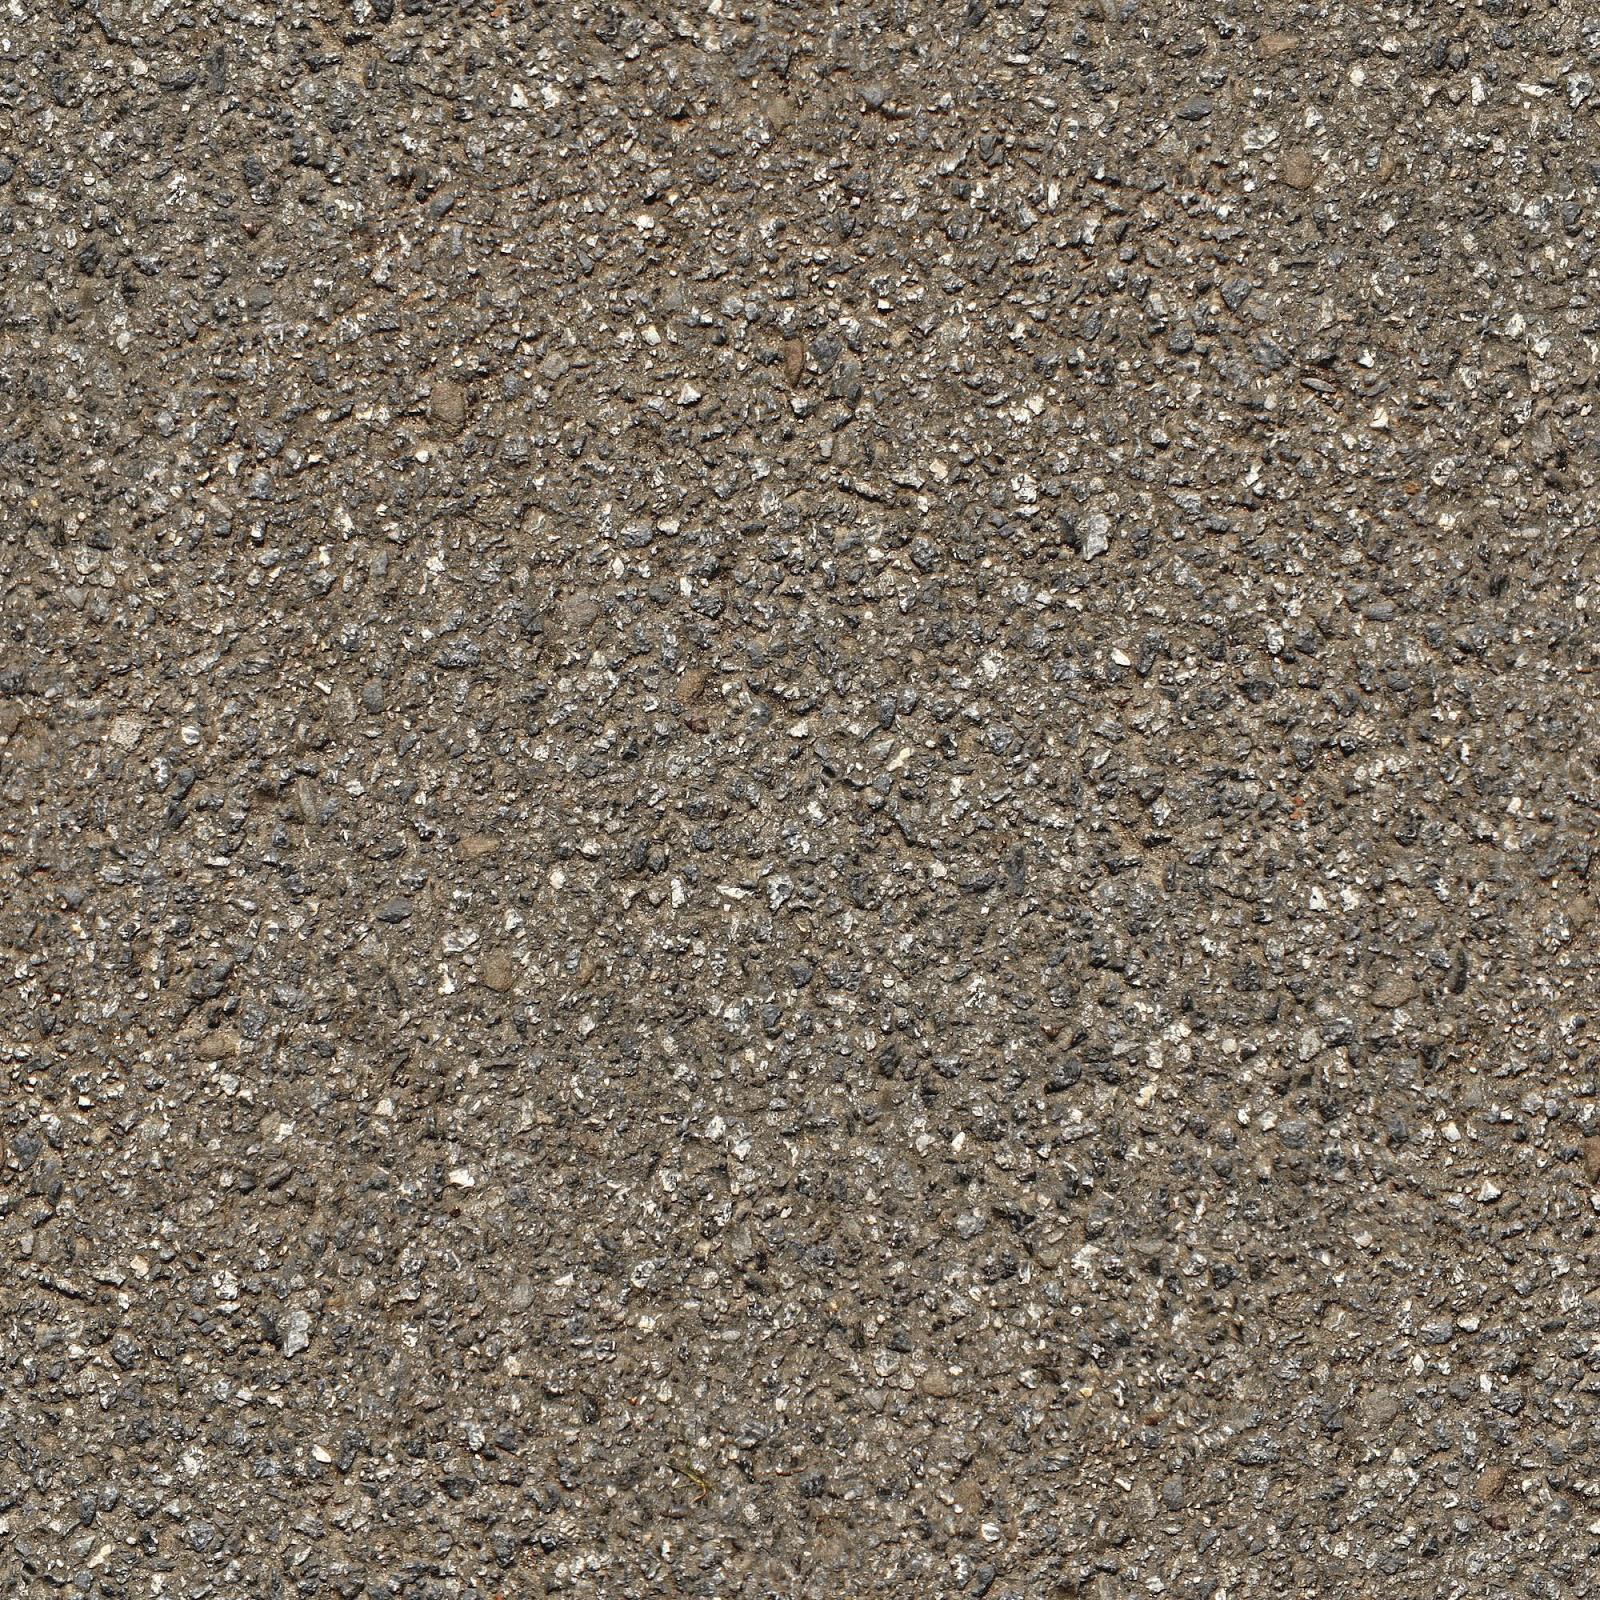 Textured Concrete Flooring : Concrete